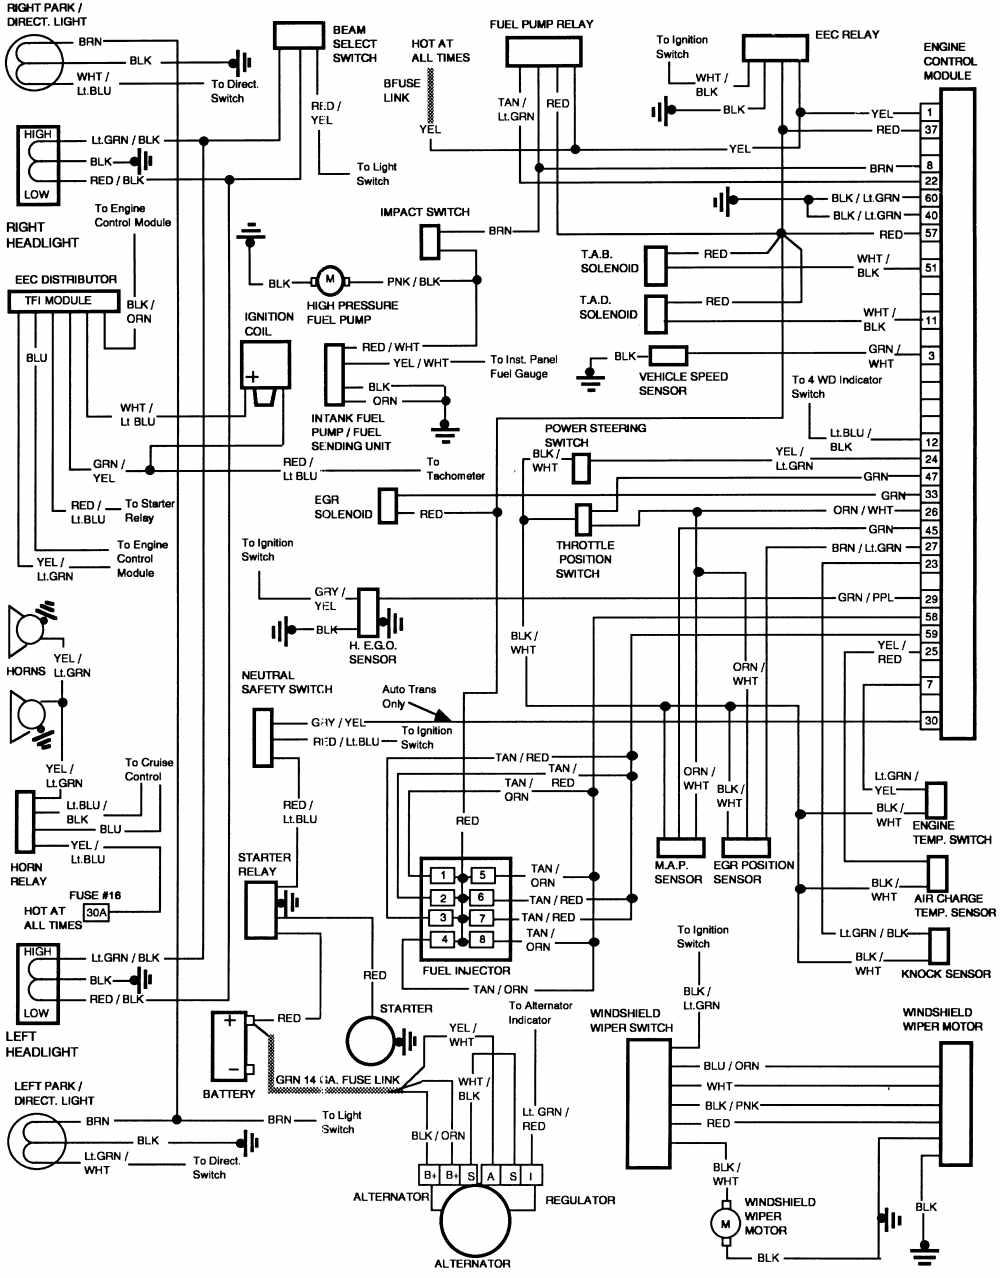 1991 jeep cherokee spark plug wiring diagram